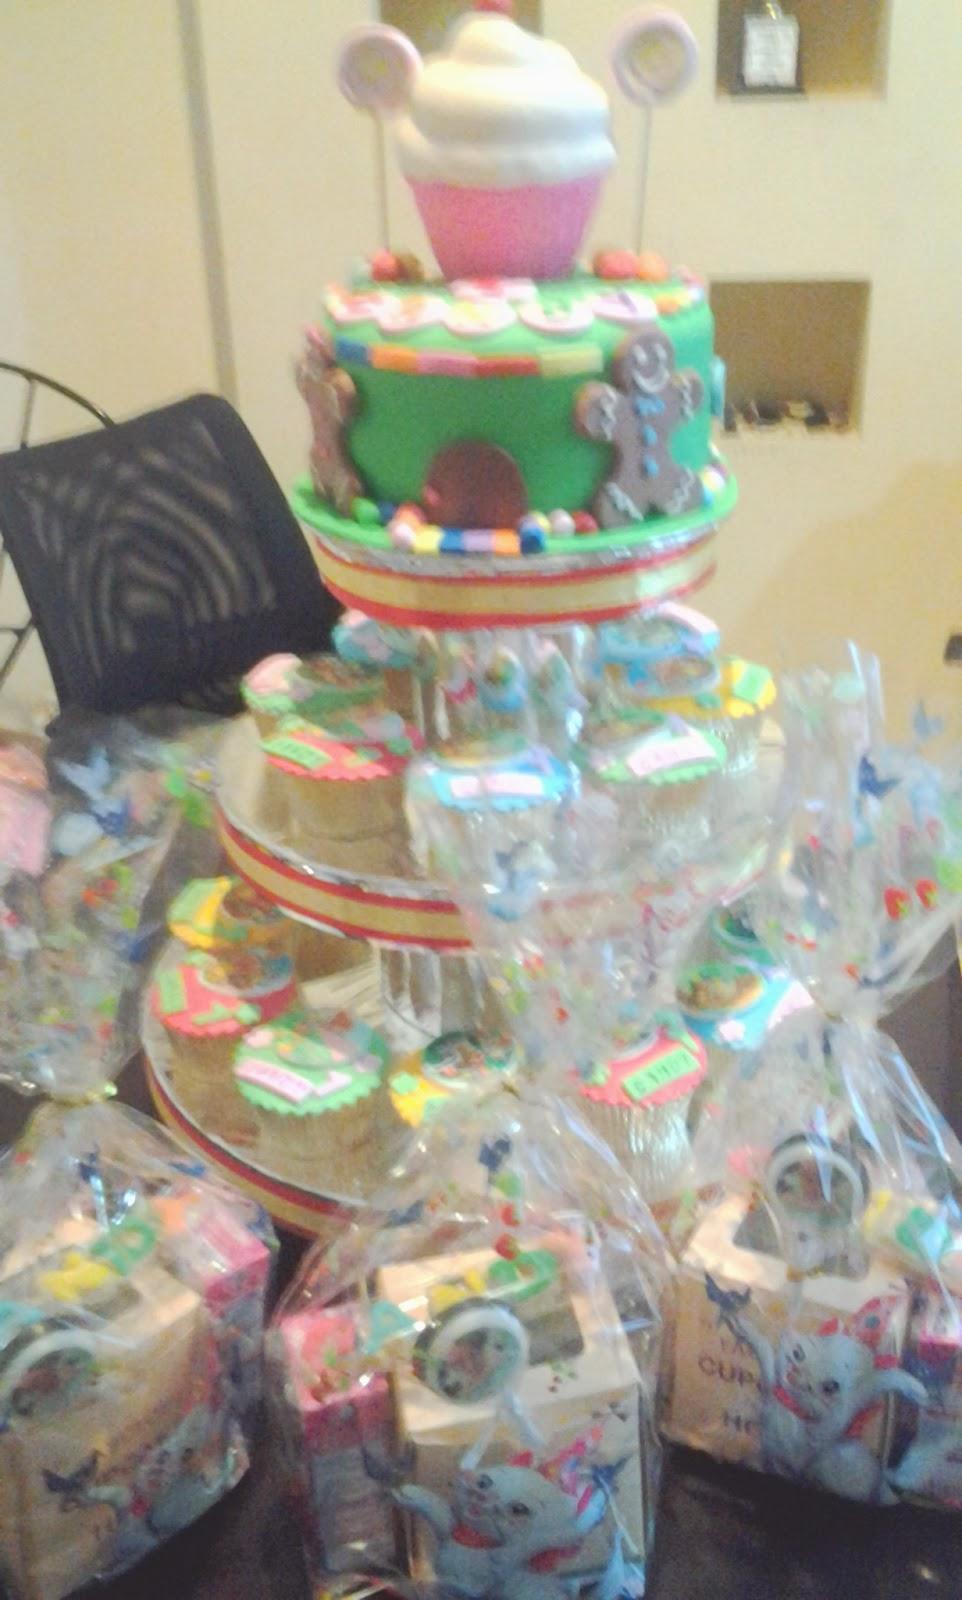 Cupcakes By Chocoholic Cupcakes Buat Goodie Bag Ulang